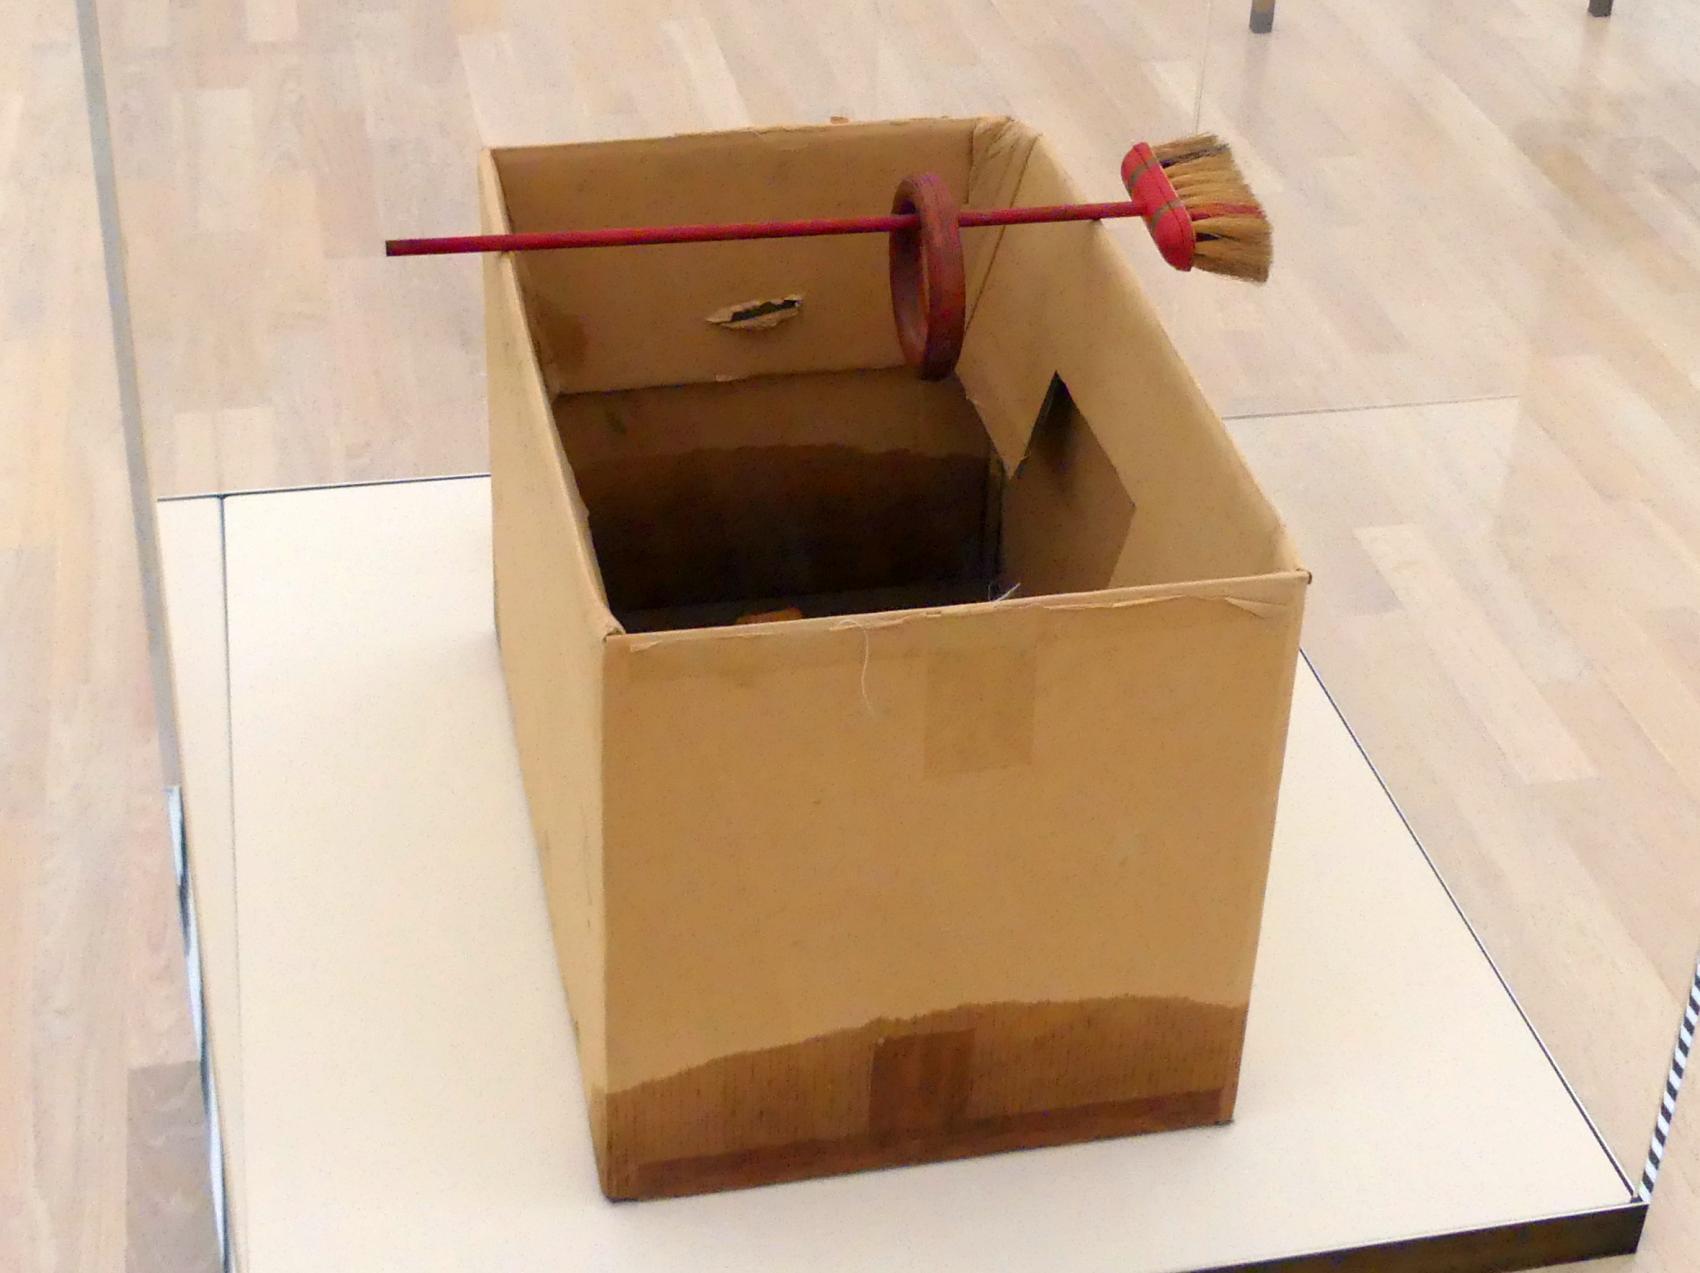 Joseph Beuys: Fluxusobjekt, 1962